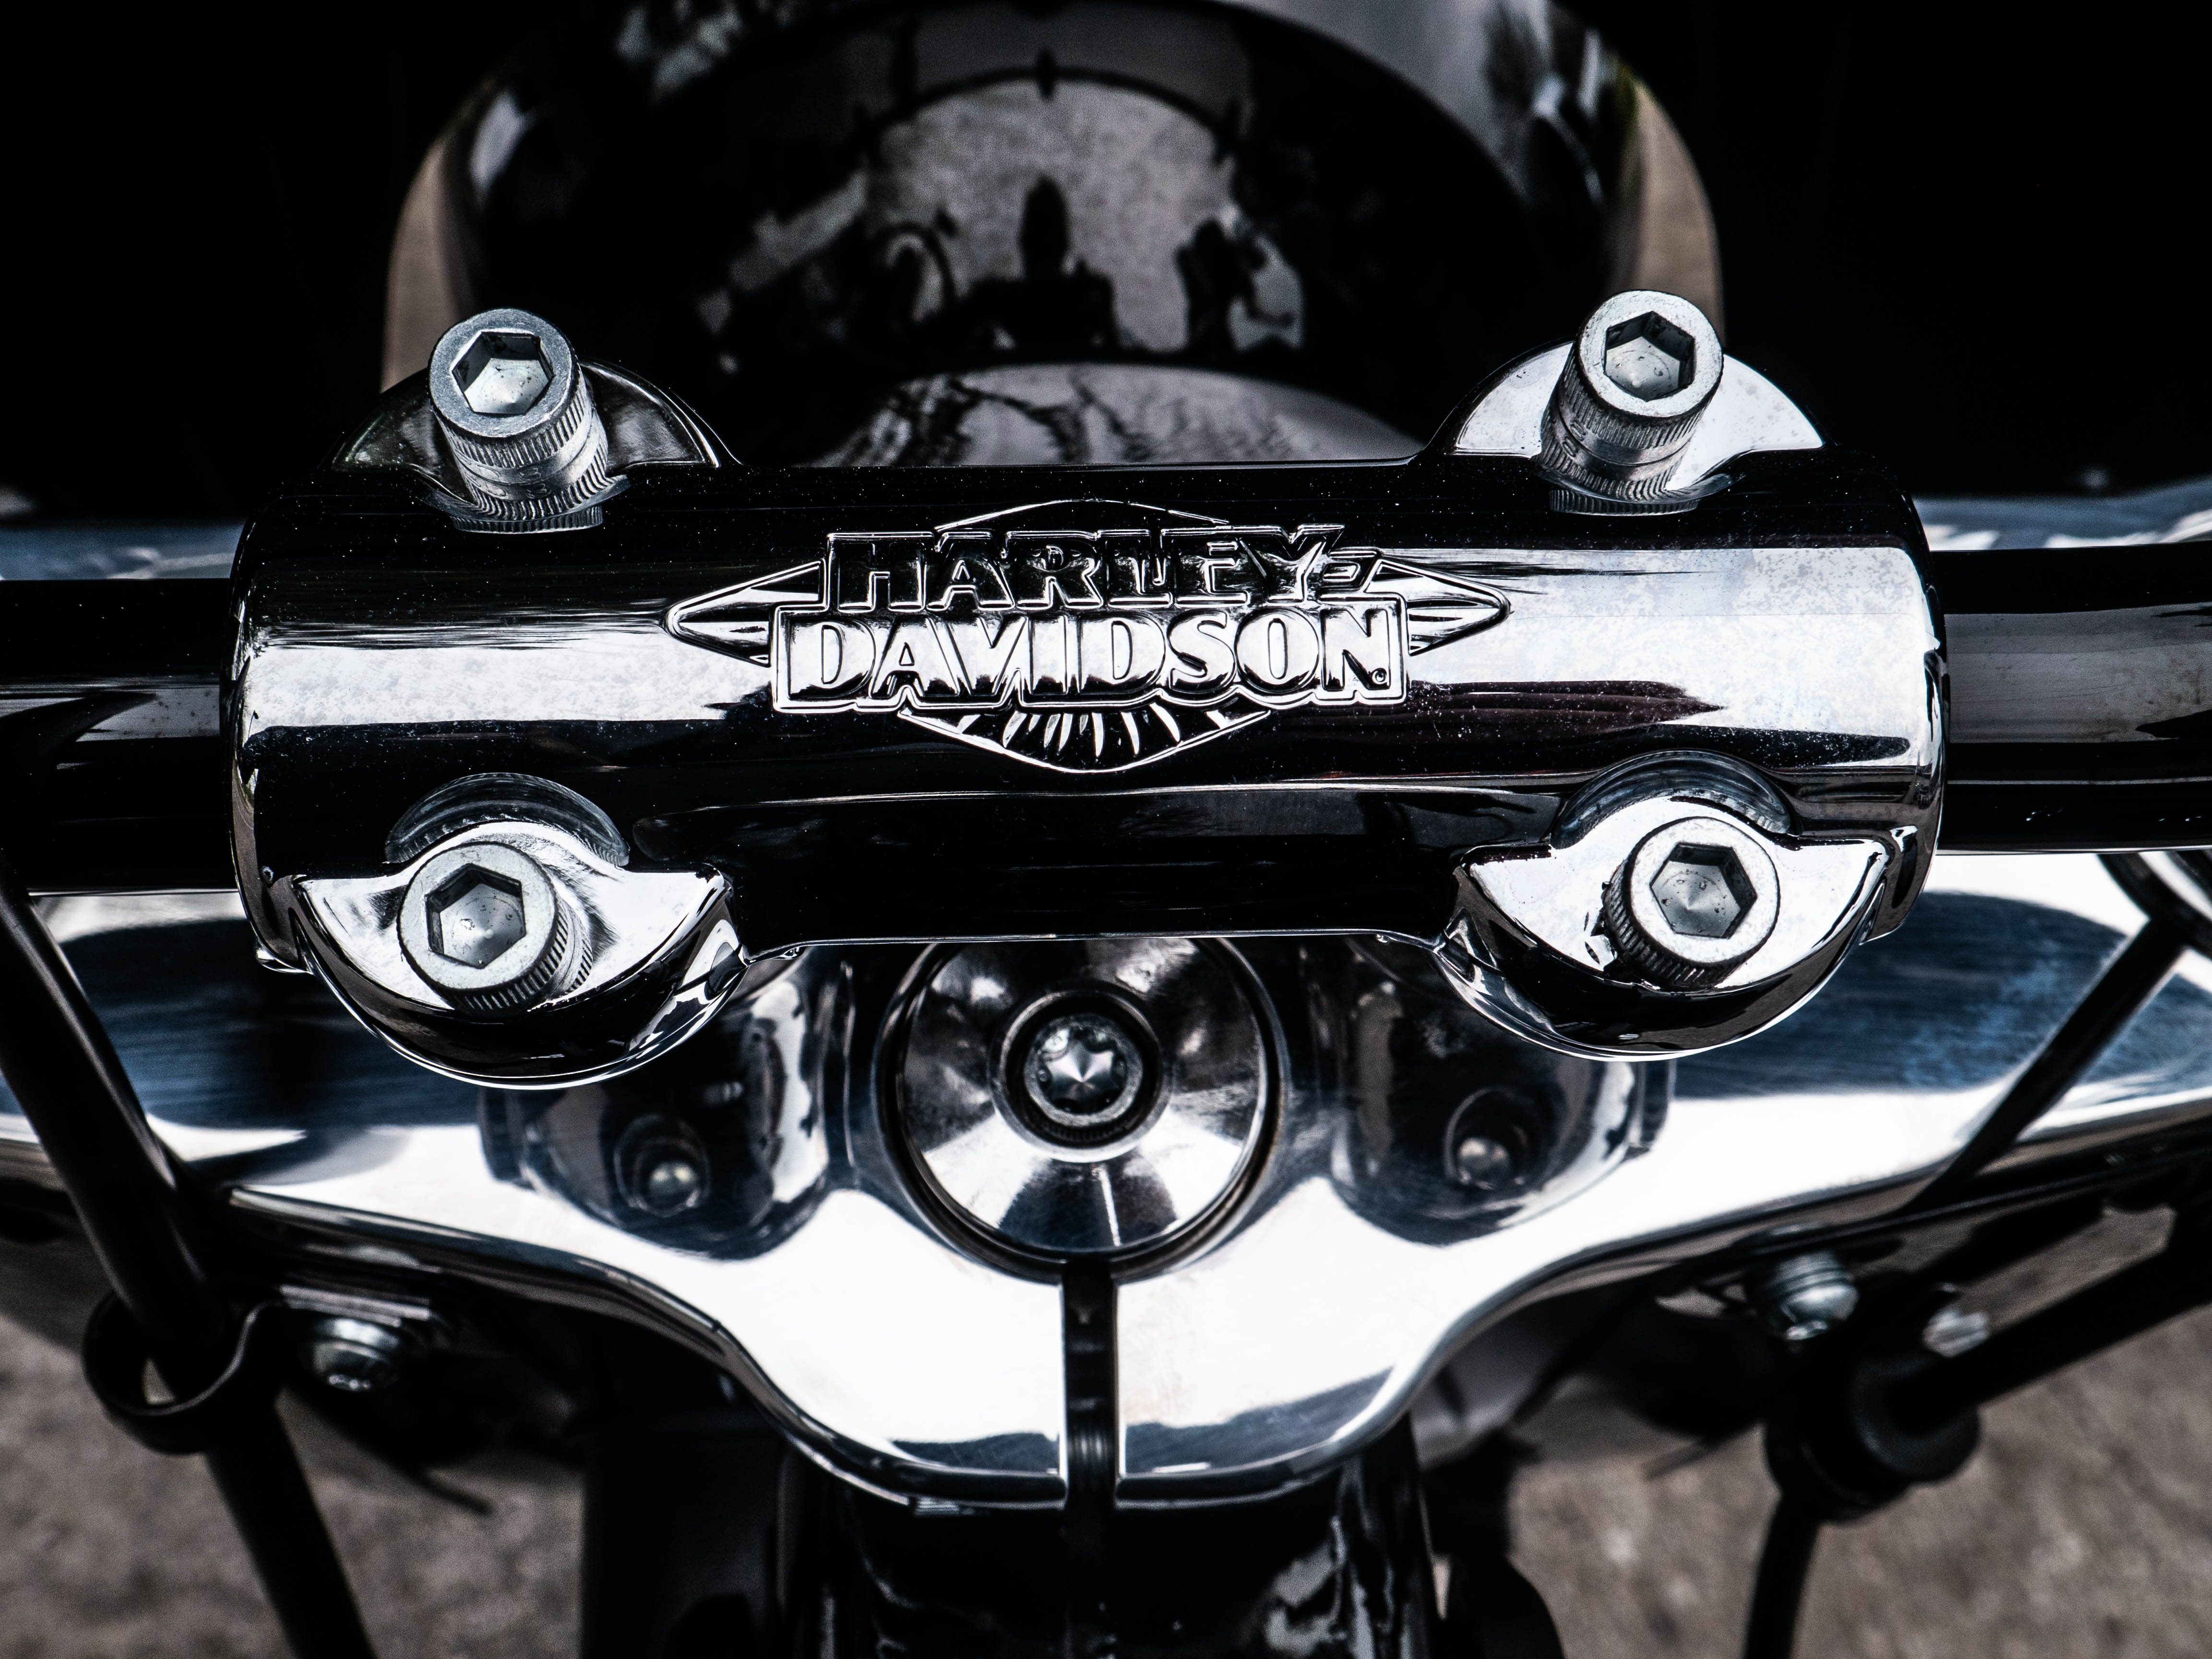 New 2019 Harley-Davidson Heritage Classic